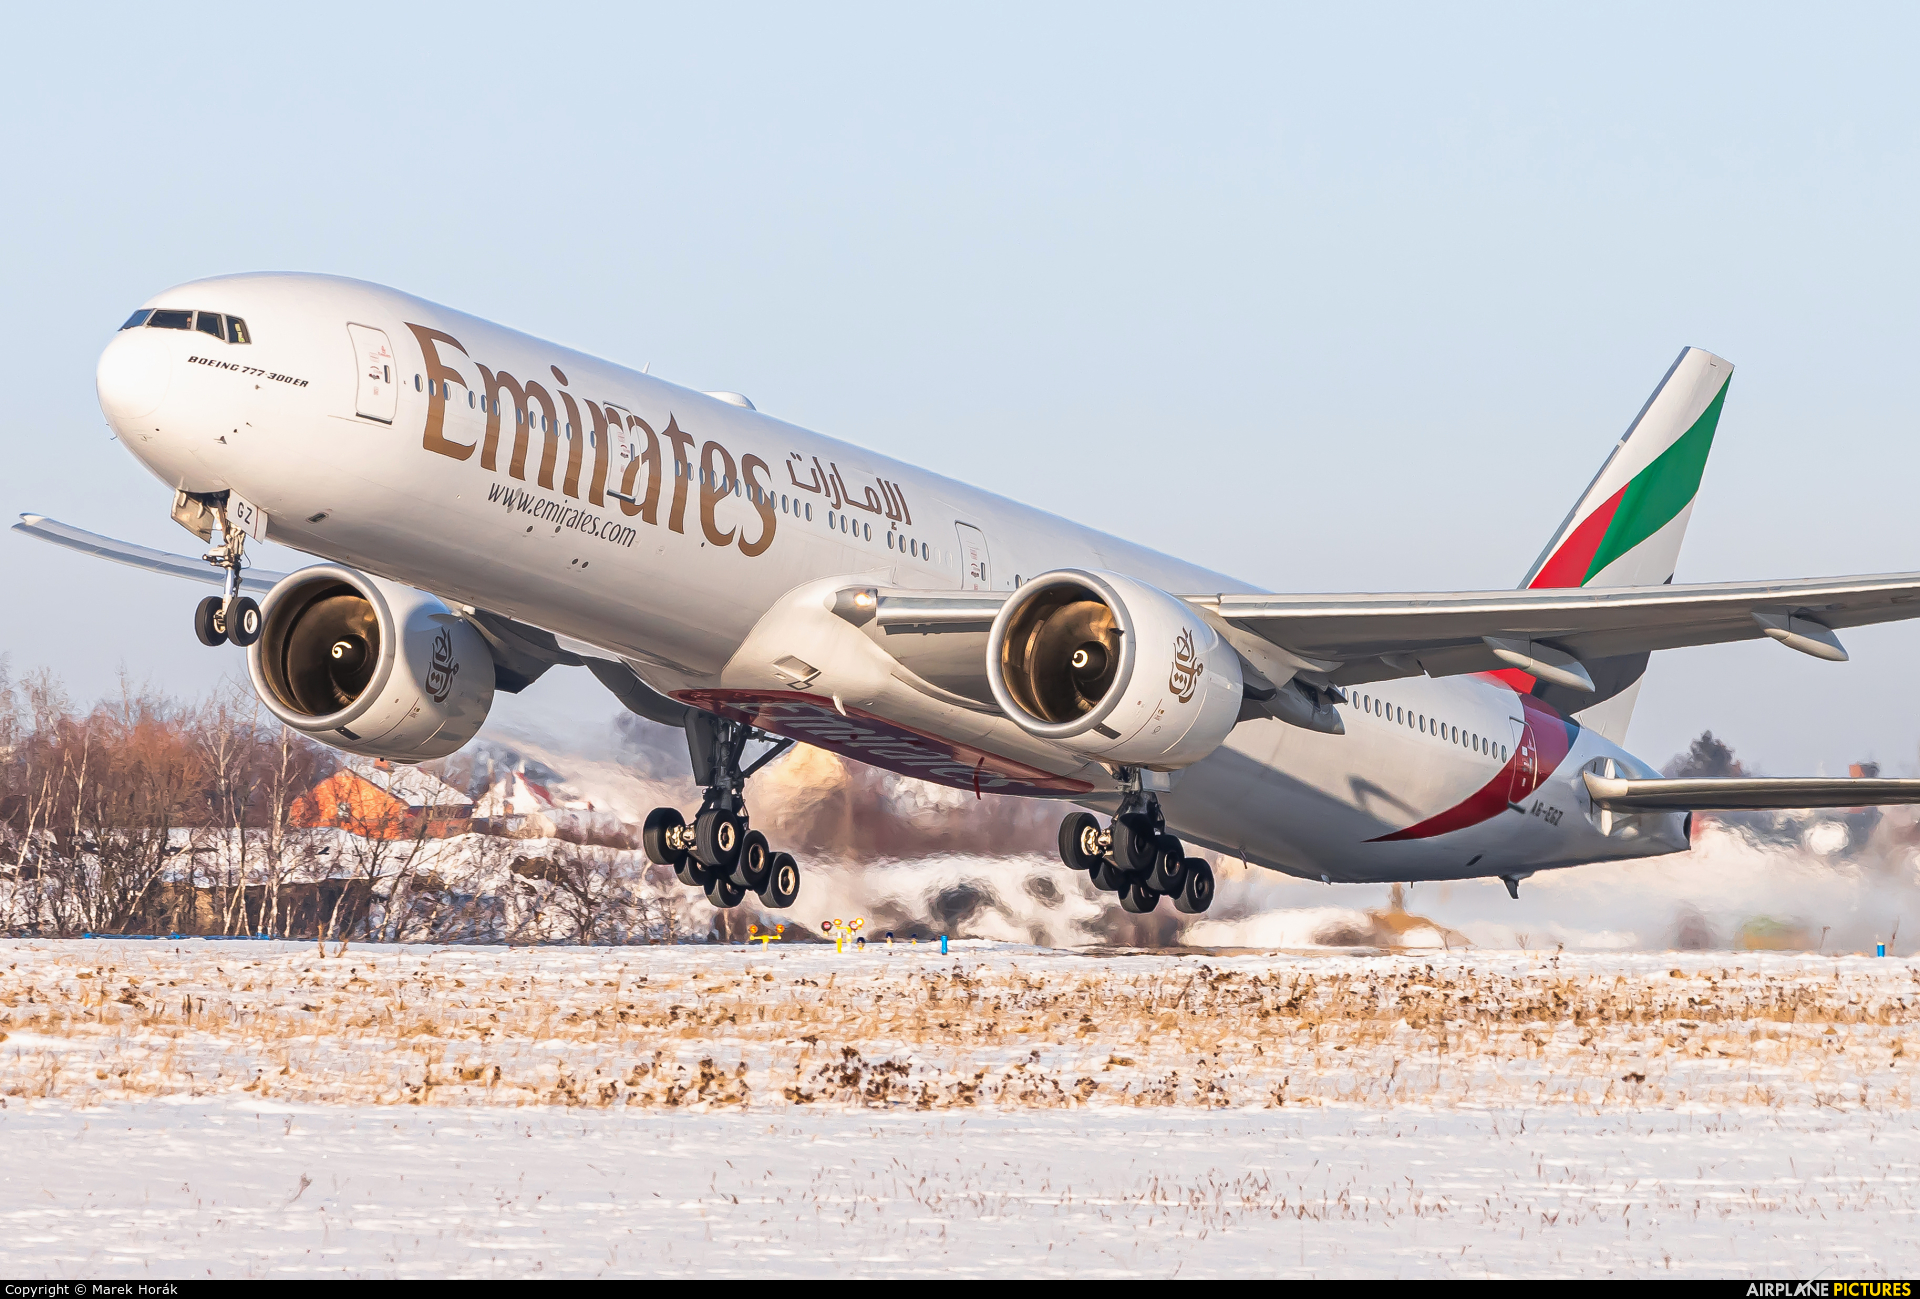 Emirates Airlines A6-EGZ aircraft at Prague - Václav Havel